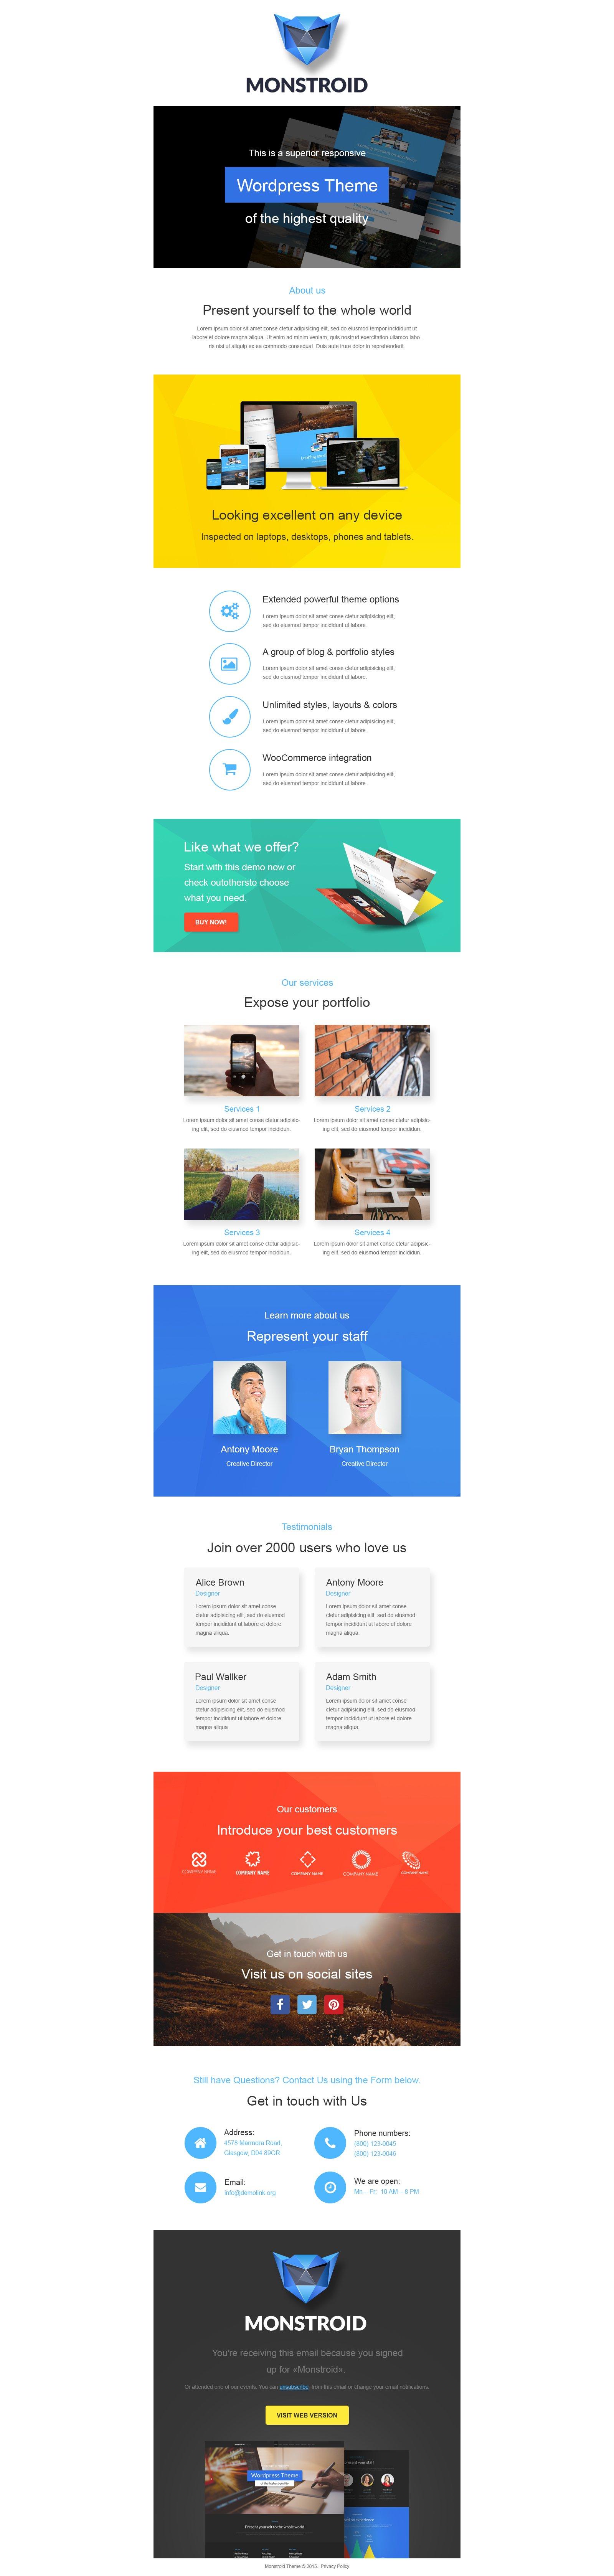 Business & Services Responsive Newsletter Template - screenshot